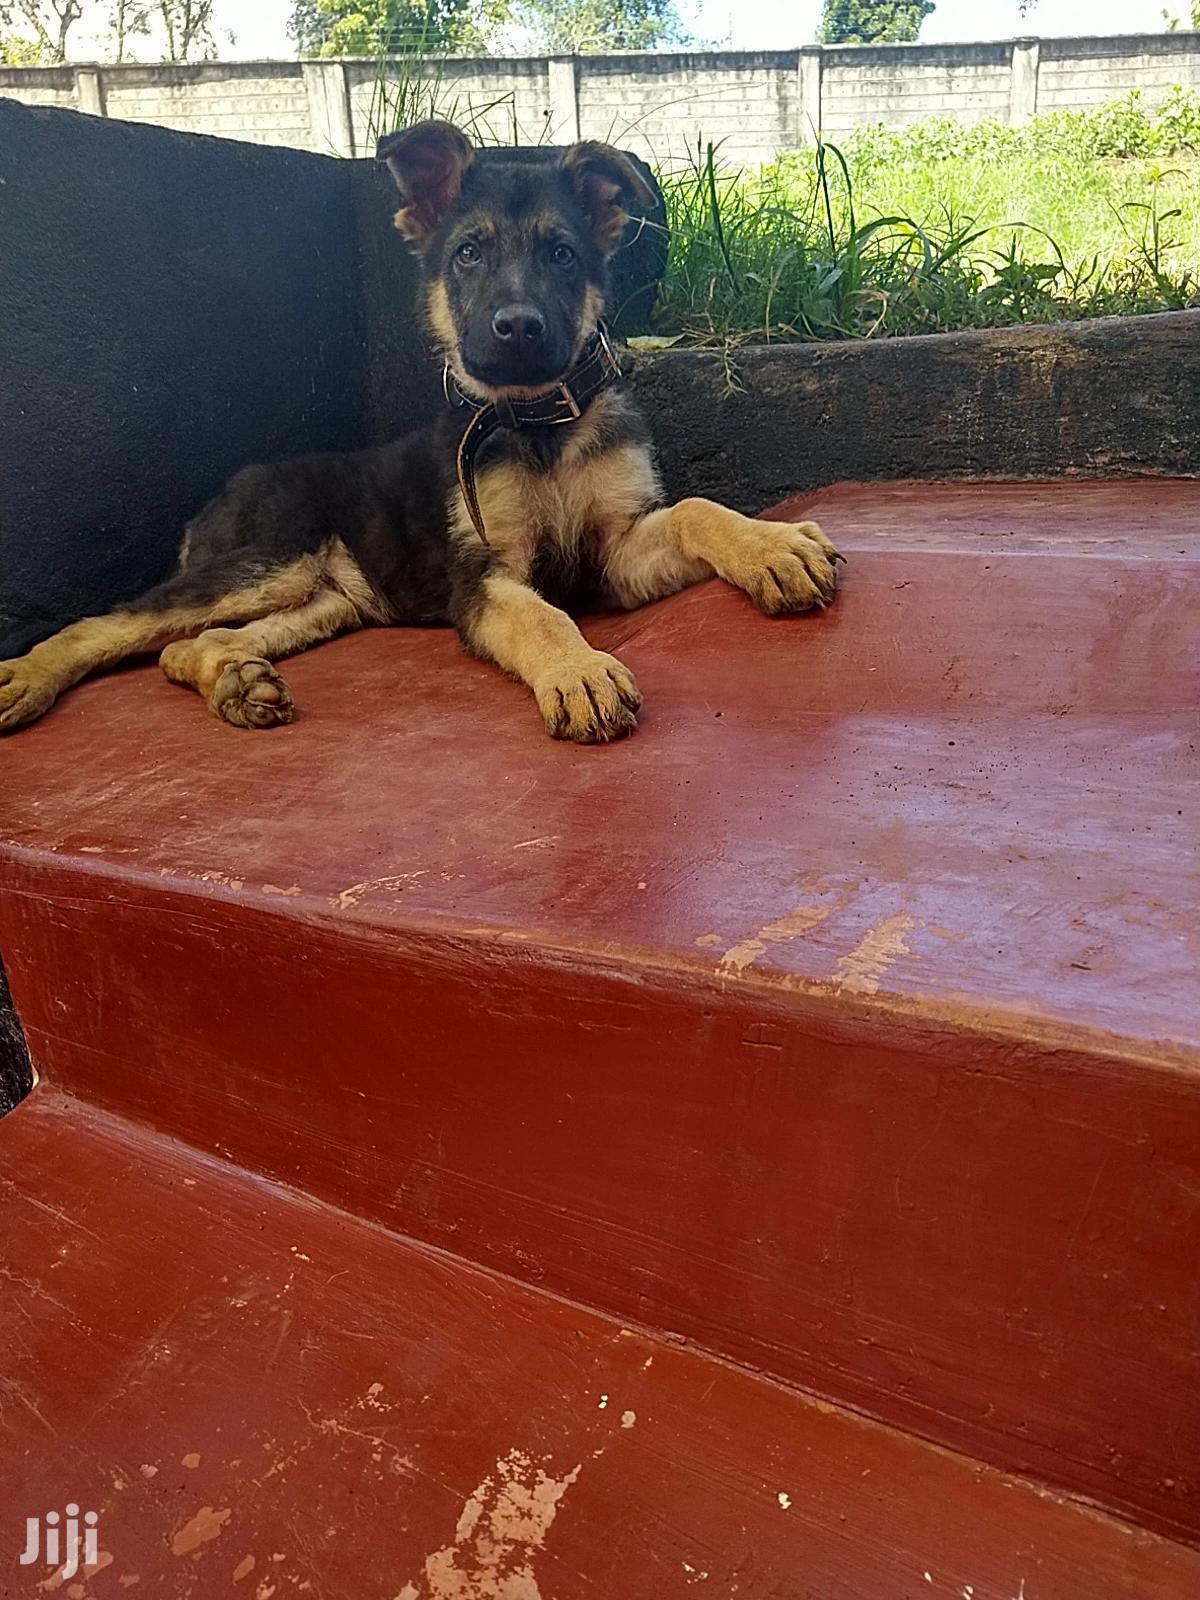 3-6 month Male Purebred German Shepherd | Dogs & Puppies for sale in Municipality, Meru, Kenya